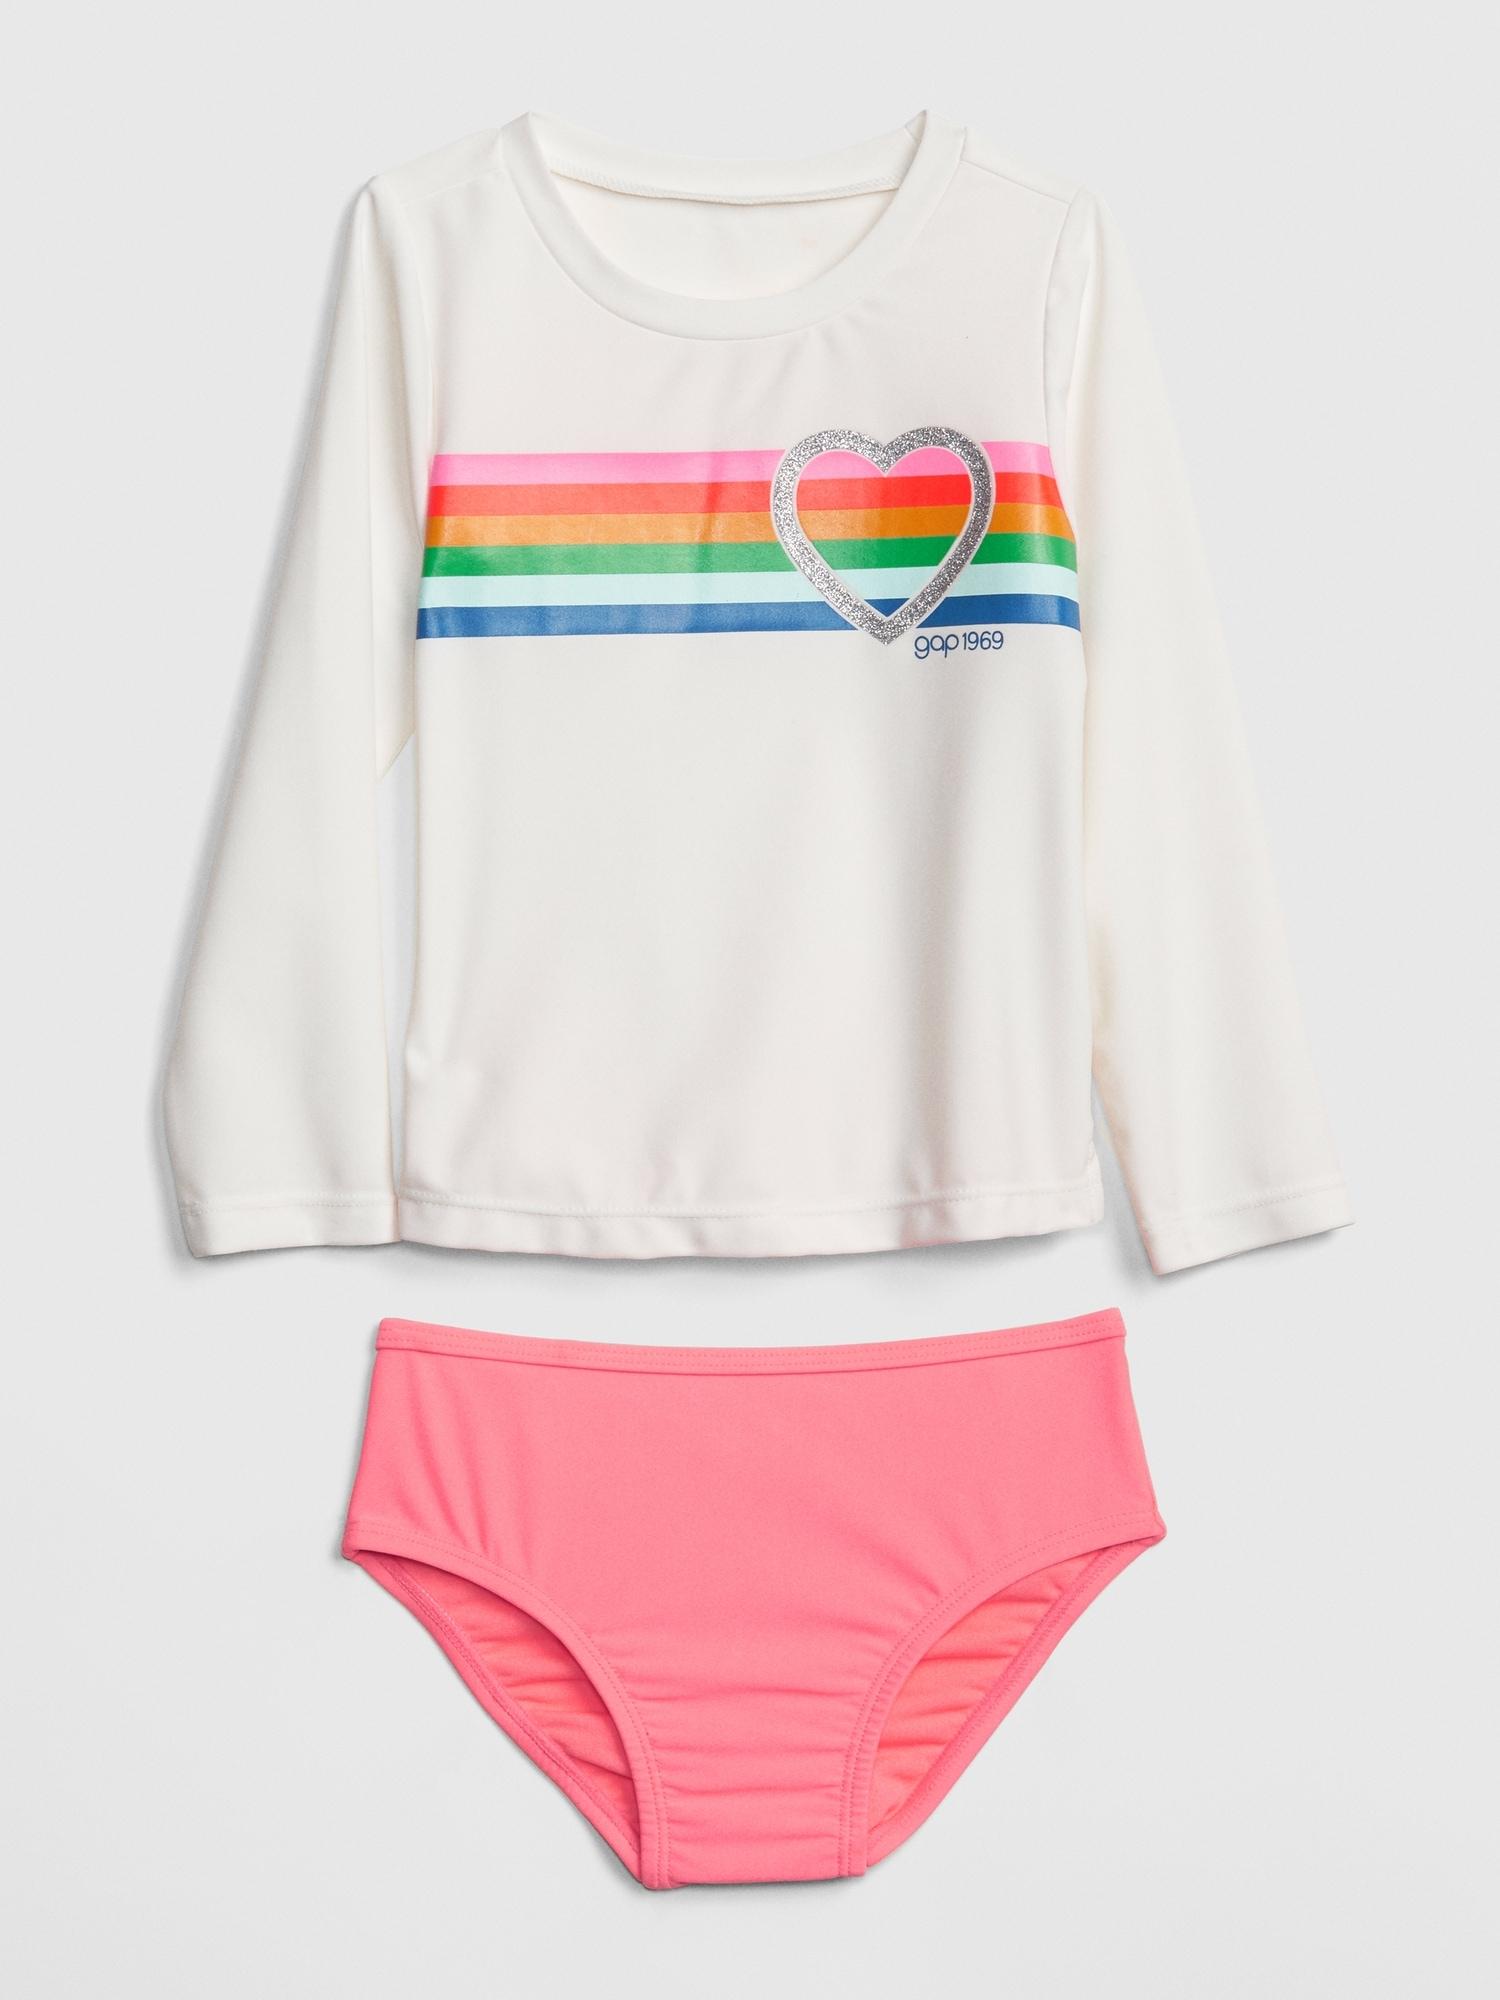 72b4f53704e8e Toddler Rashguard Swim Two-Piece | Gap